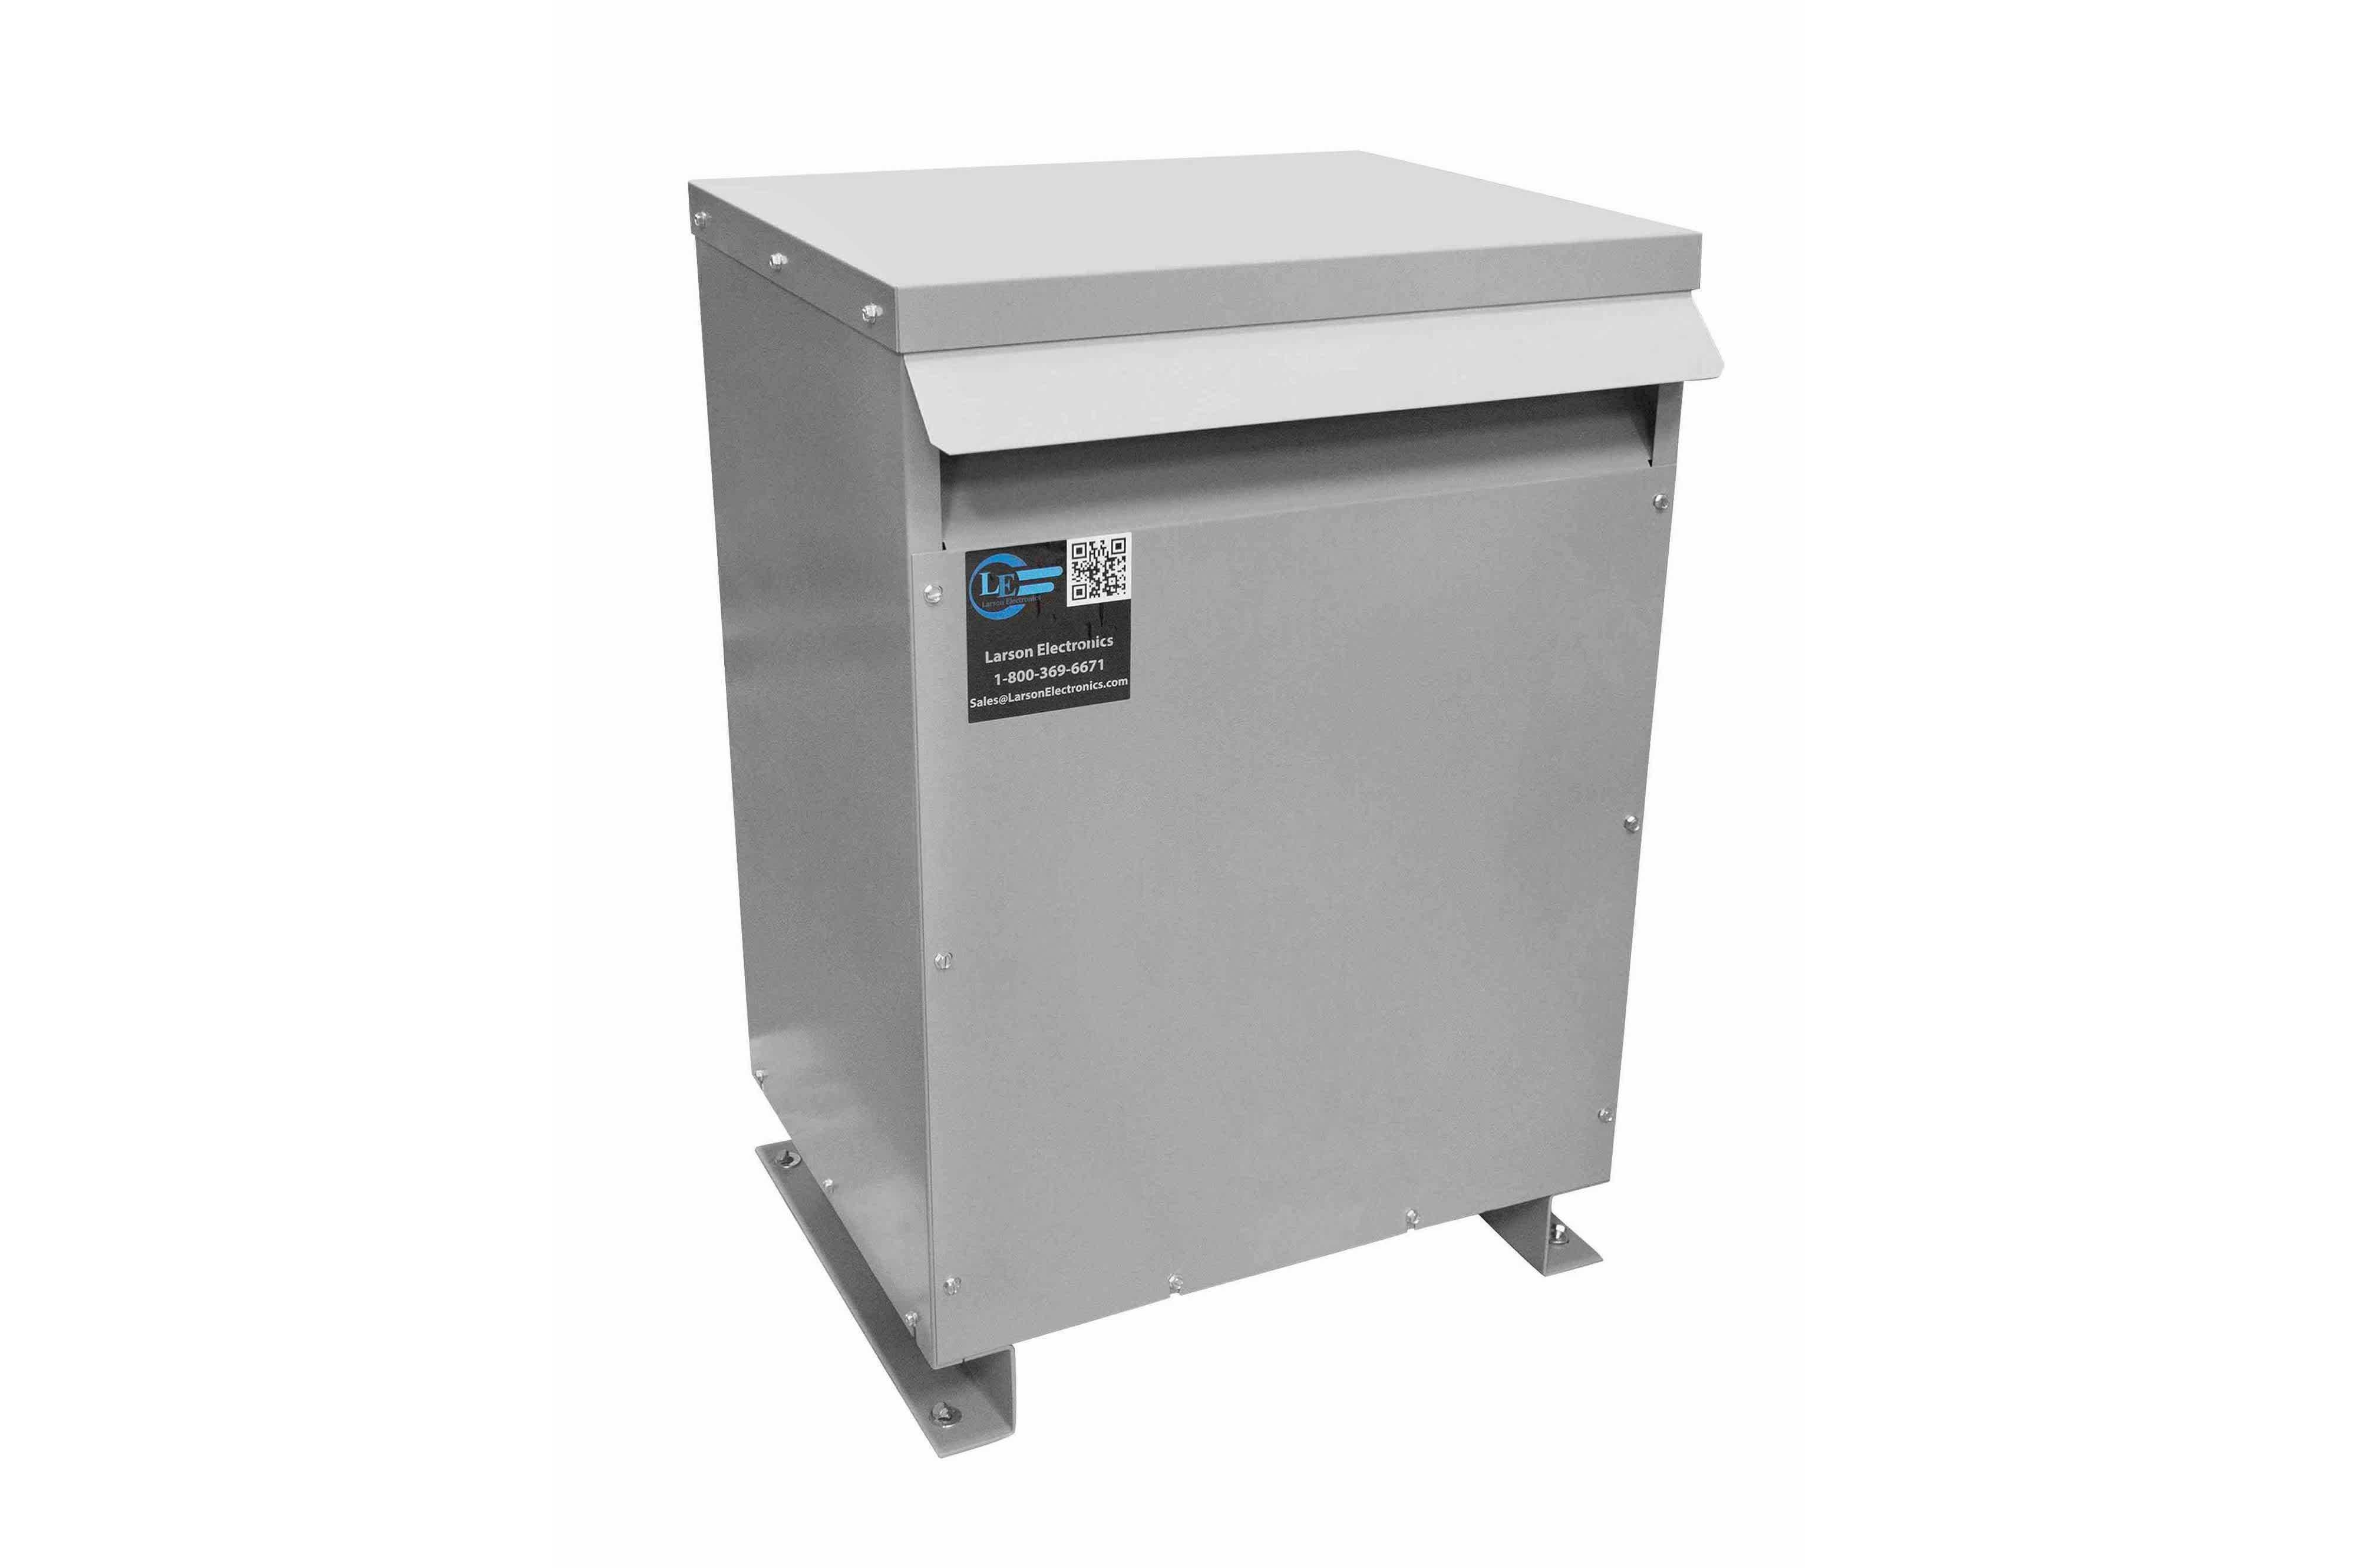 112.5 kVA 3PH Isolation Transformer, 460V Wye Primary, 380V Delta Secondary, N3R, Ventilated, 60 Hz